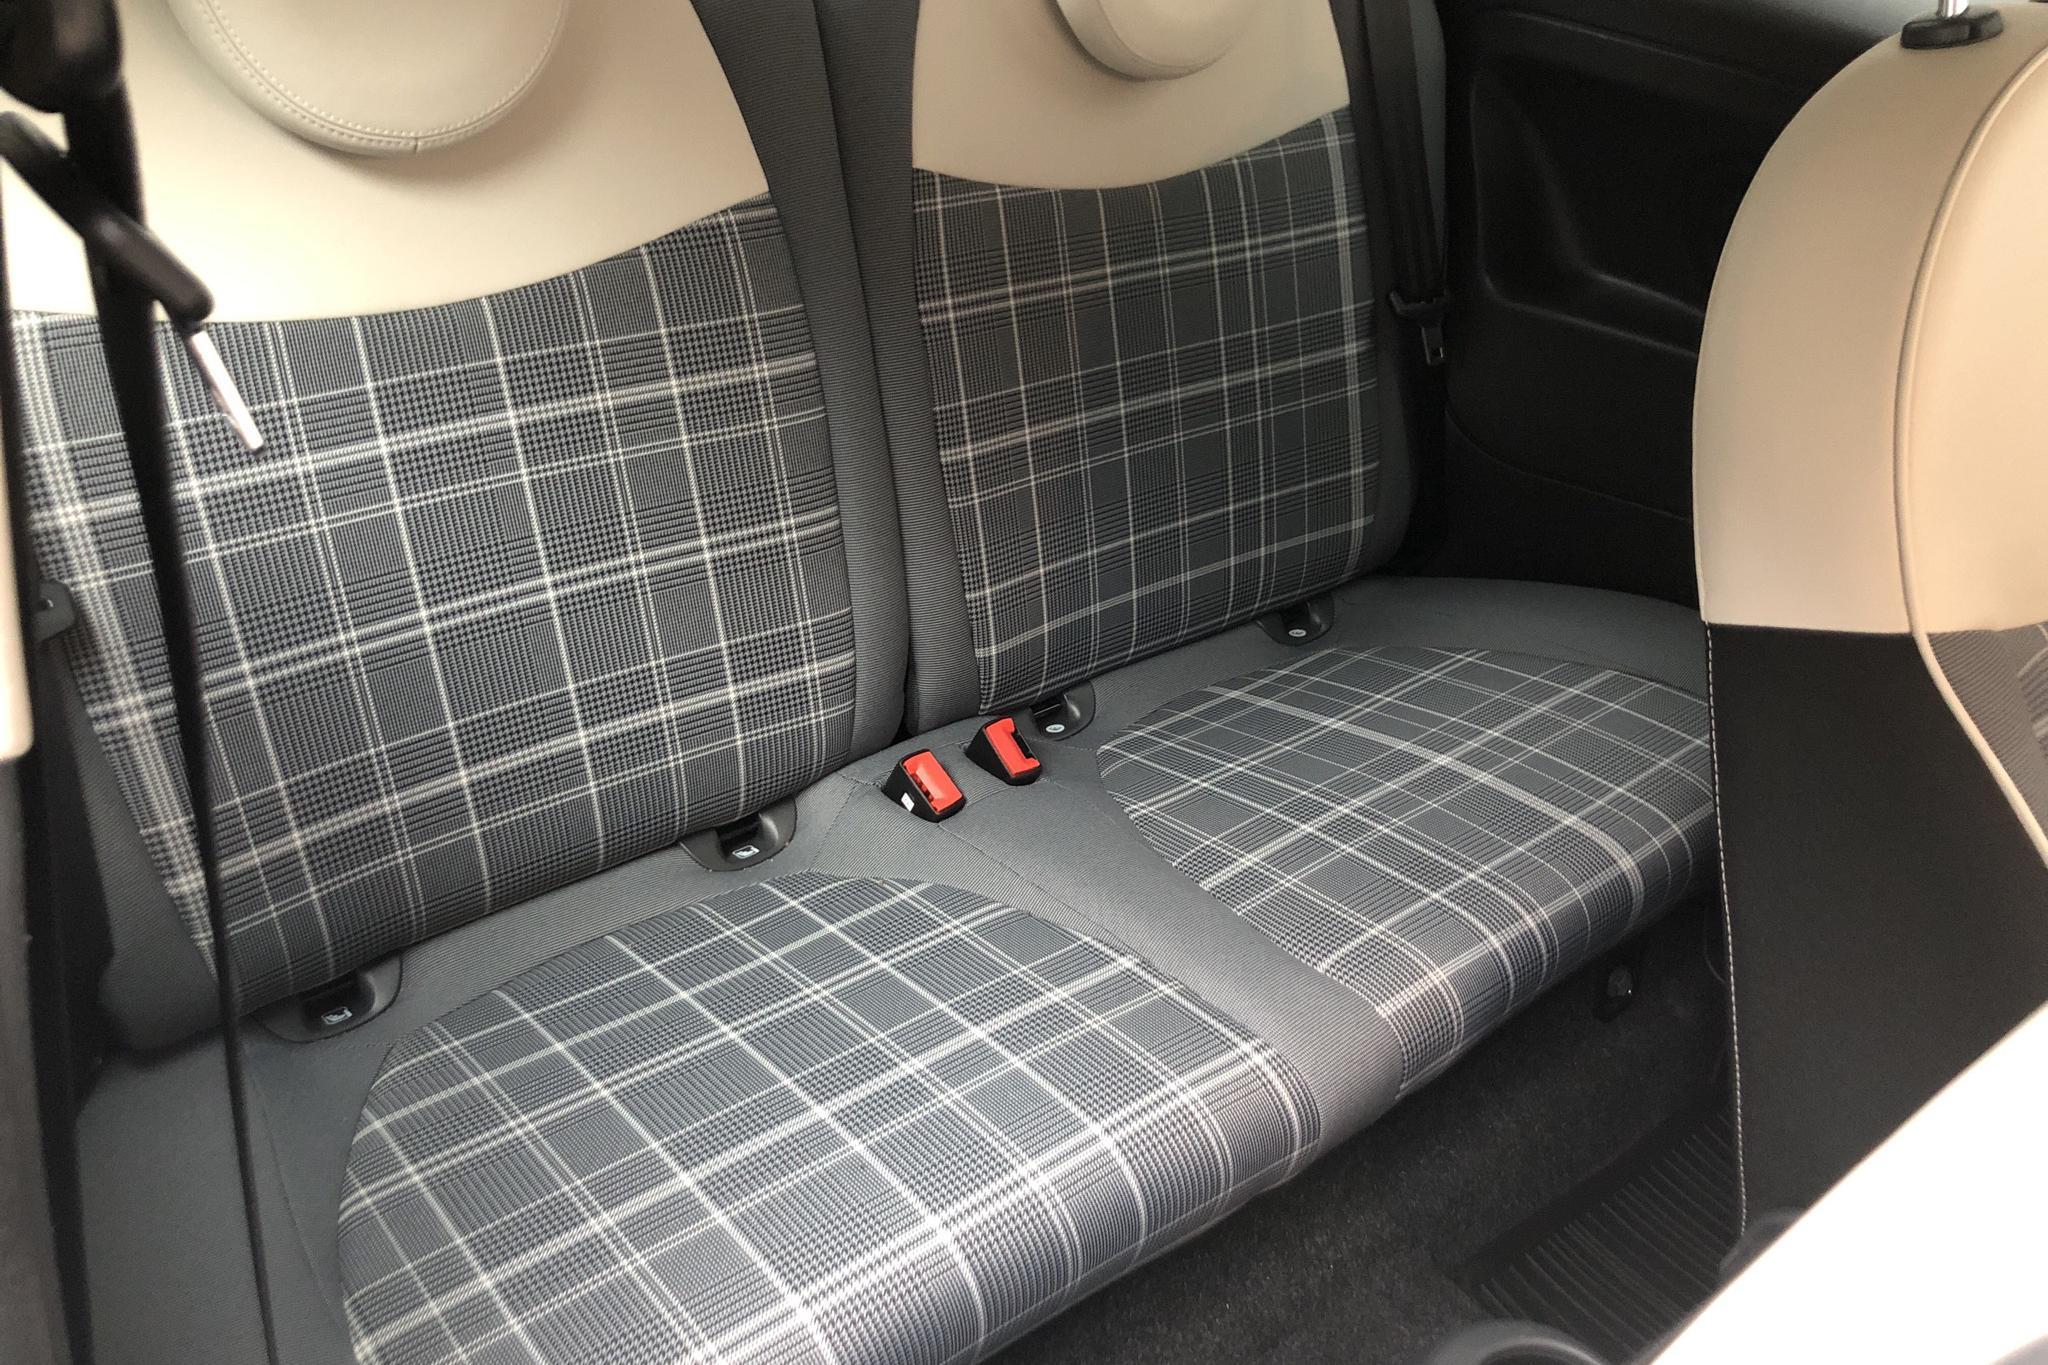 Fiat 500C 1.2 (69hk) - 2 166 mil - Manuell - blå - 2017